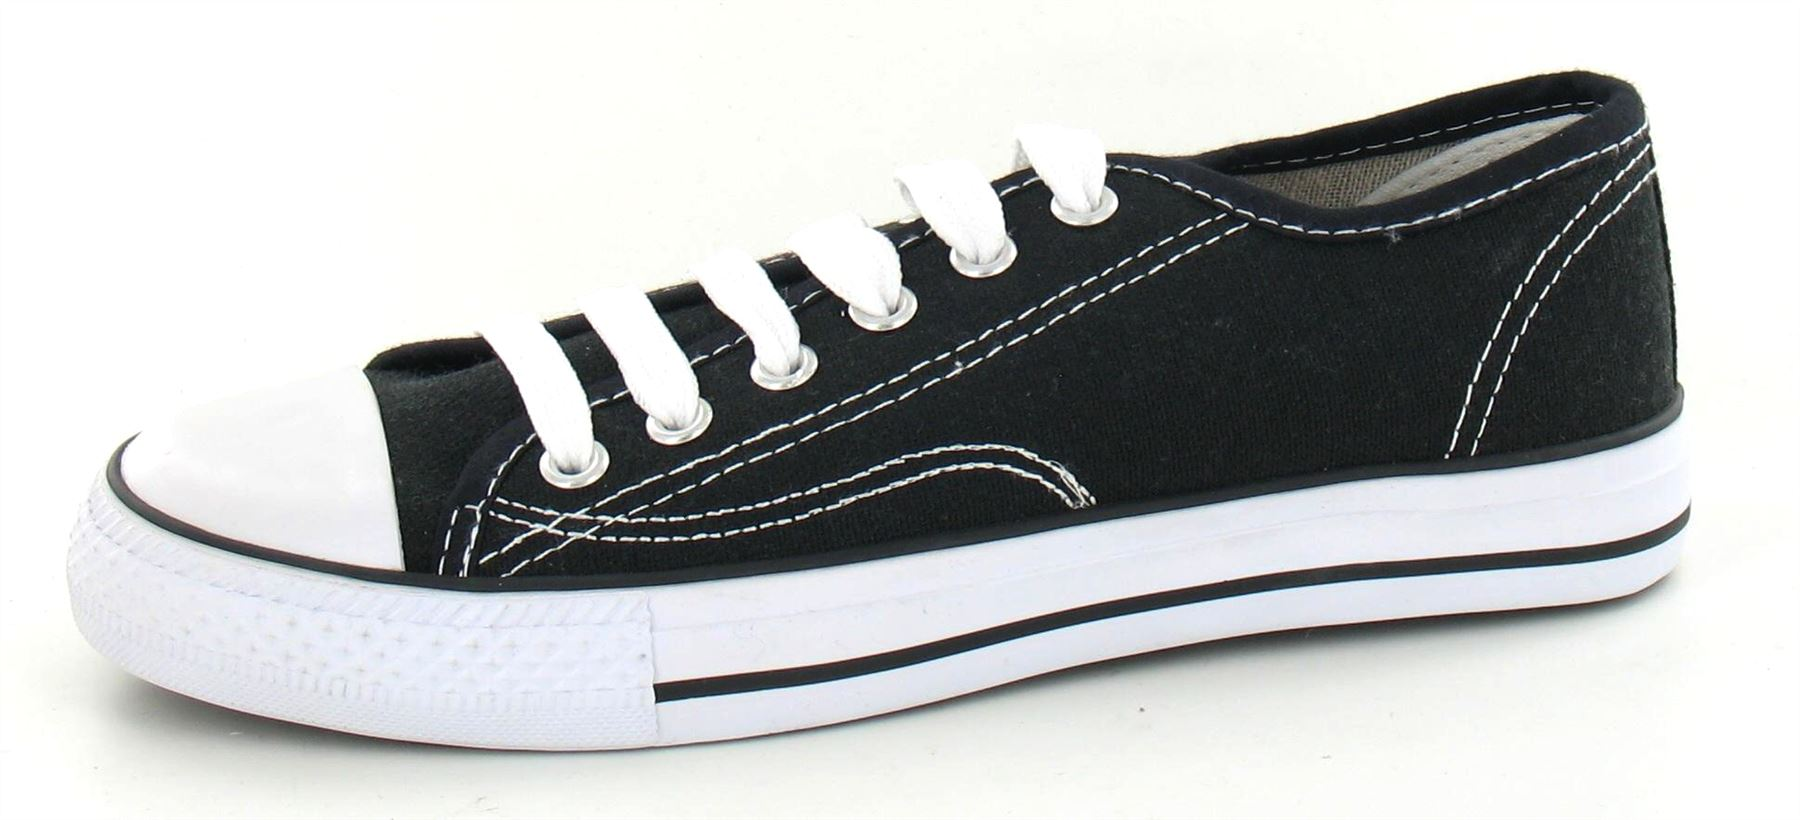 octave 174 mens retro vintage black lace up canvas shoes with